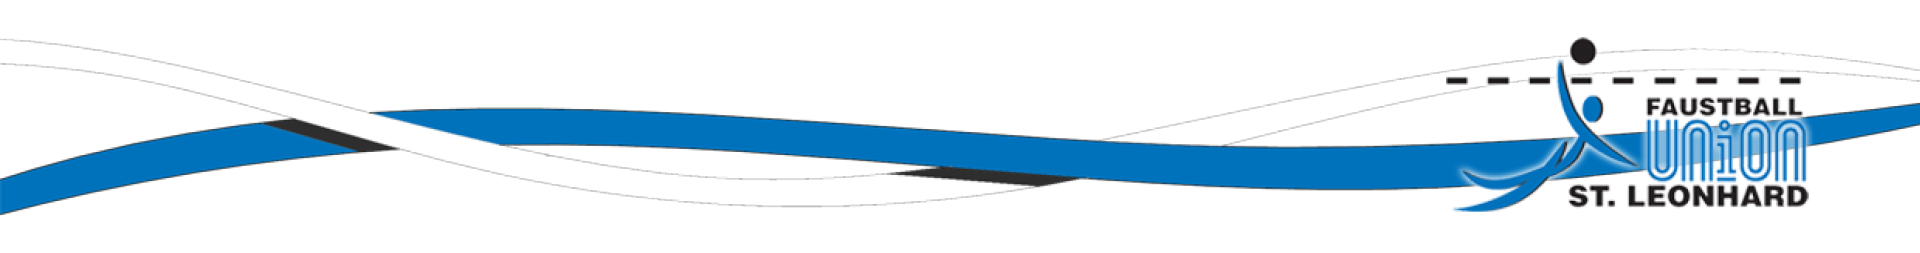 Faustball – Union tgaplan St. Leonhard